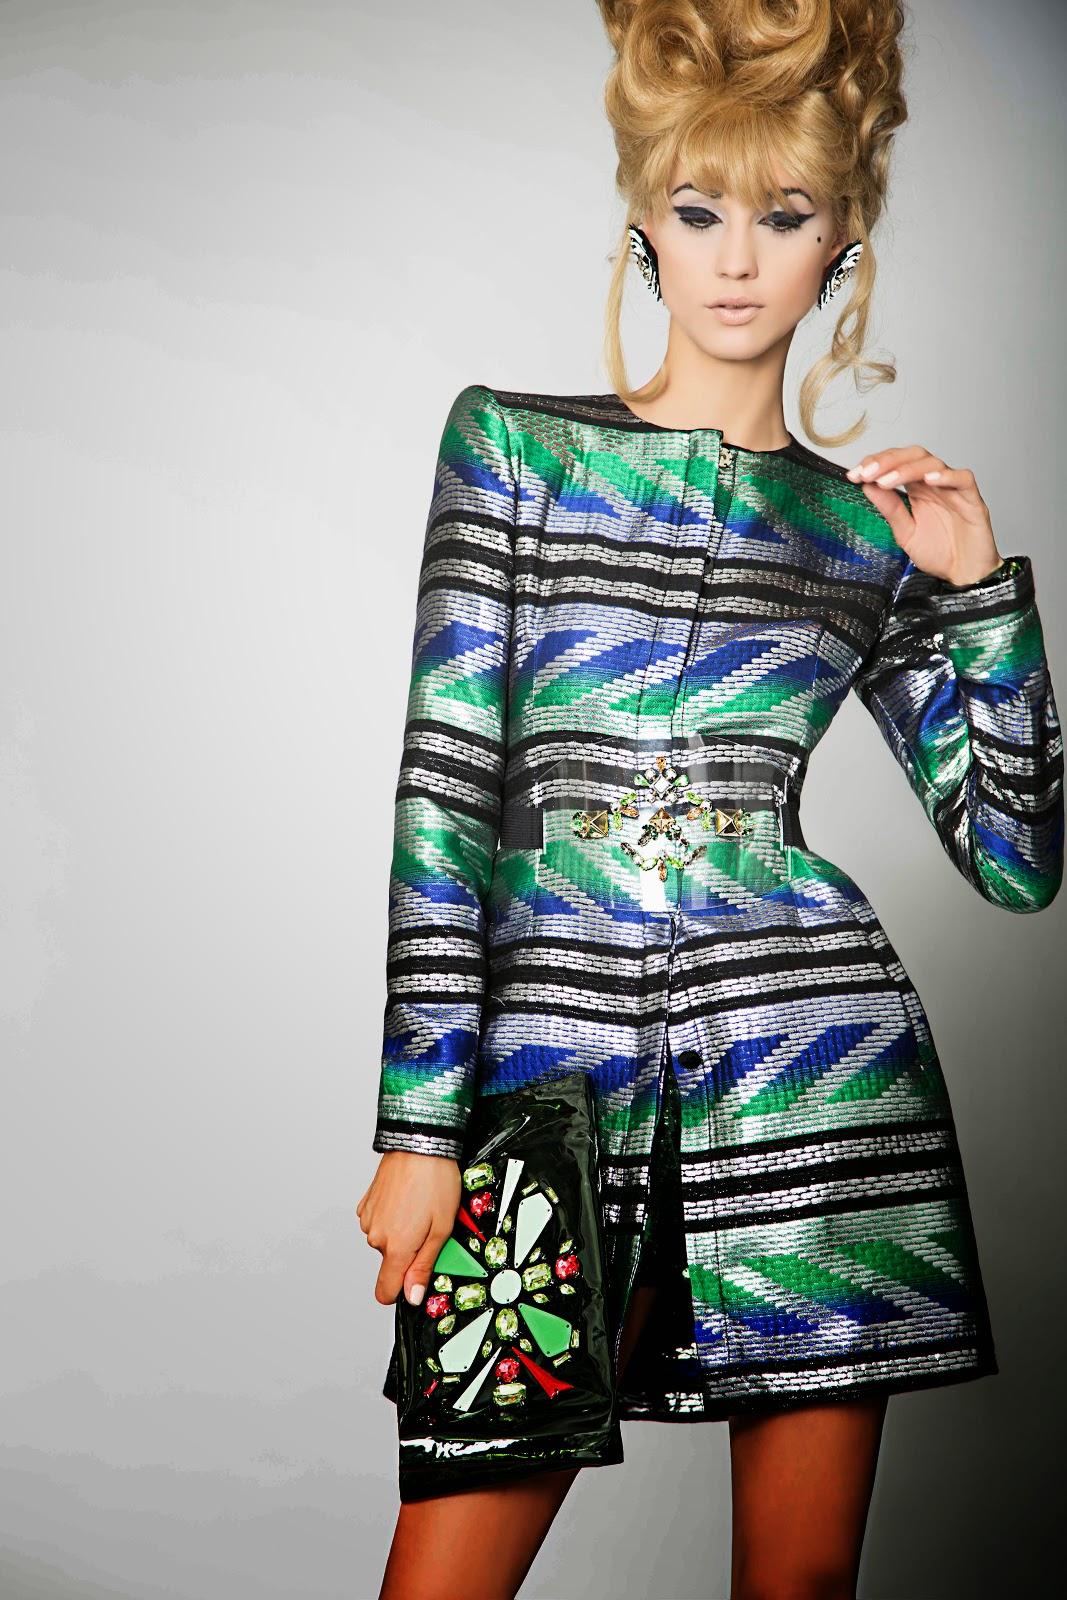 gabrielefiorucci, gabrieleffe, themorasmoothie, ss15, springsummer, primaveraestate, fashion, fashionblog, fashionblogger, stilista, designer, ootd, outfit, look, picoftheday, photooftheday, paola buonacara